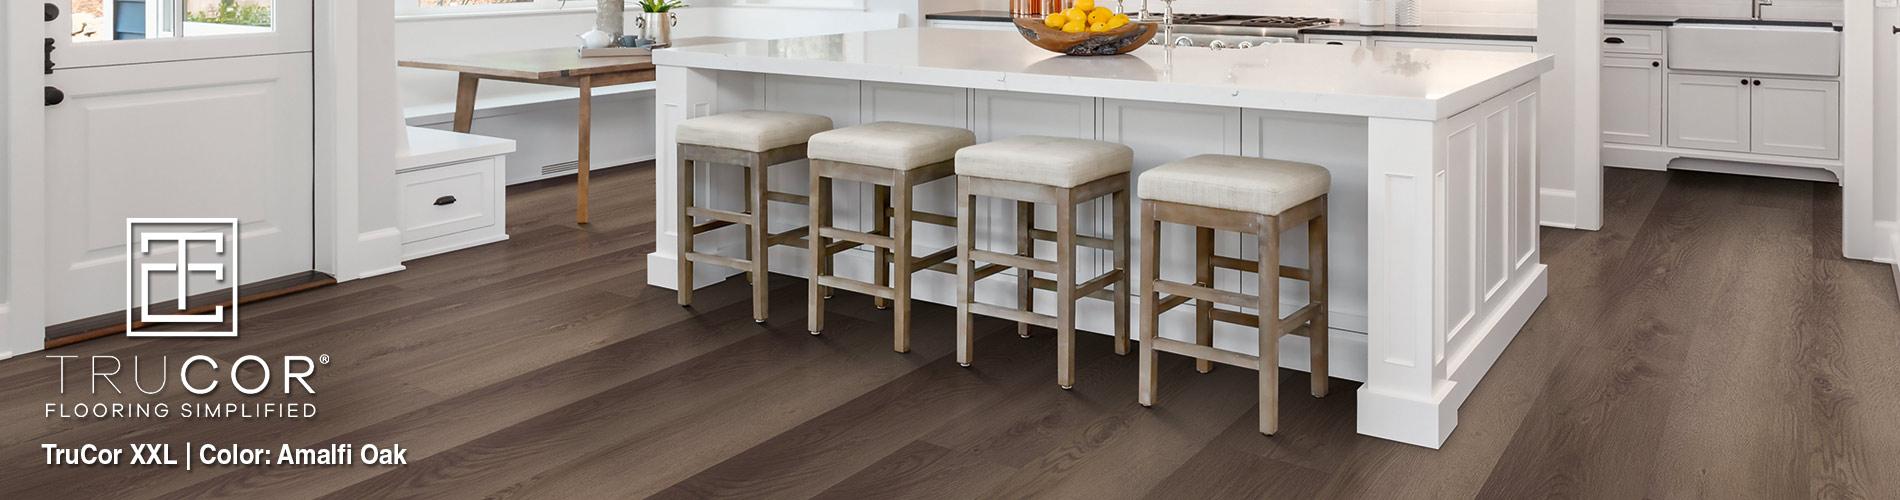 TruCor - Flooring Simplified - TruCor XXL | Color: Amalfi Oak